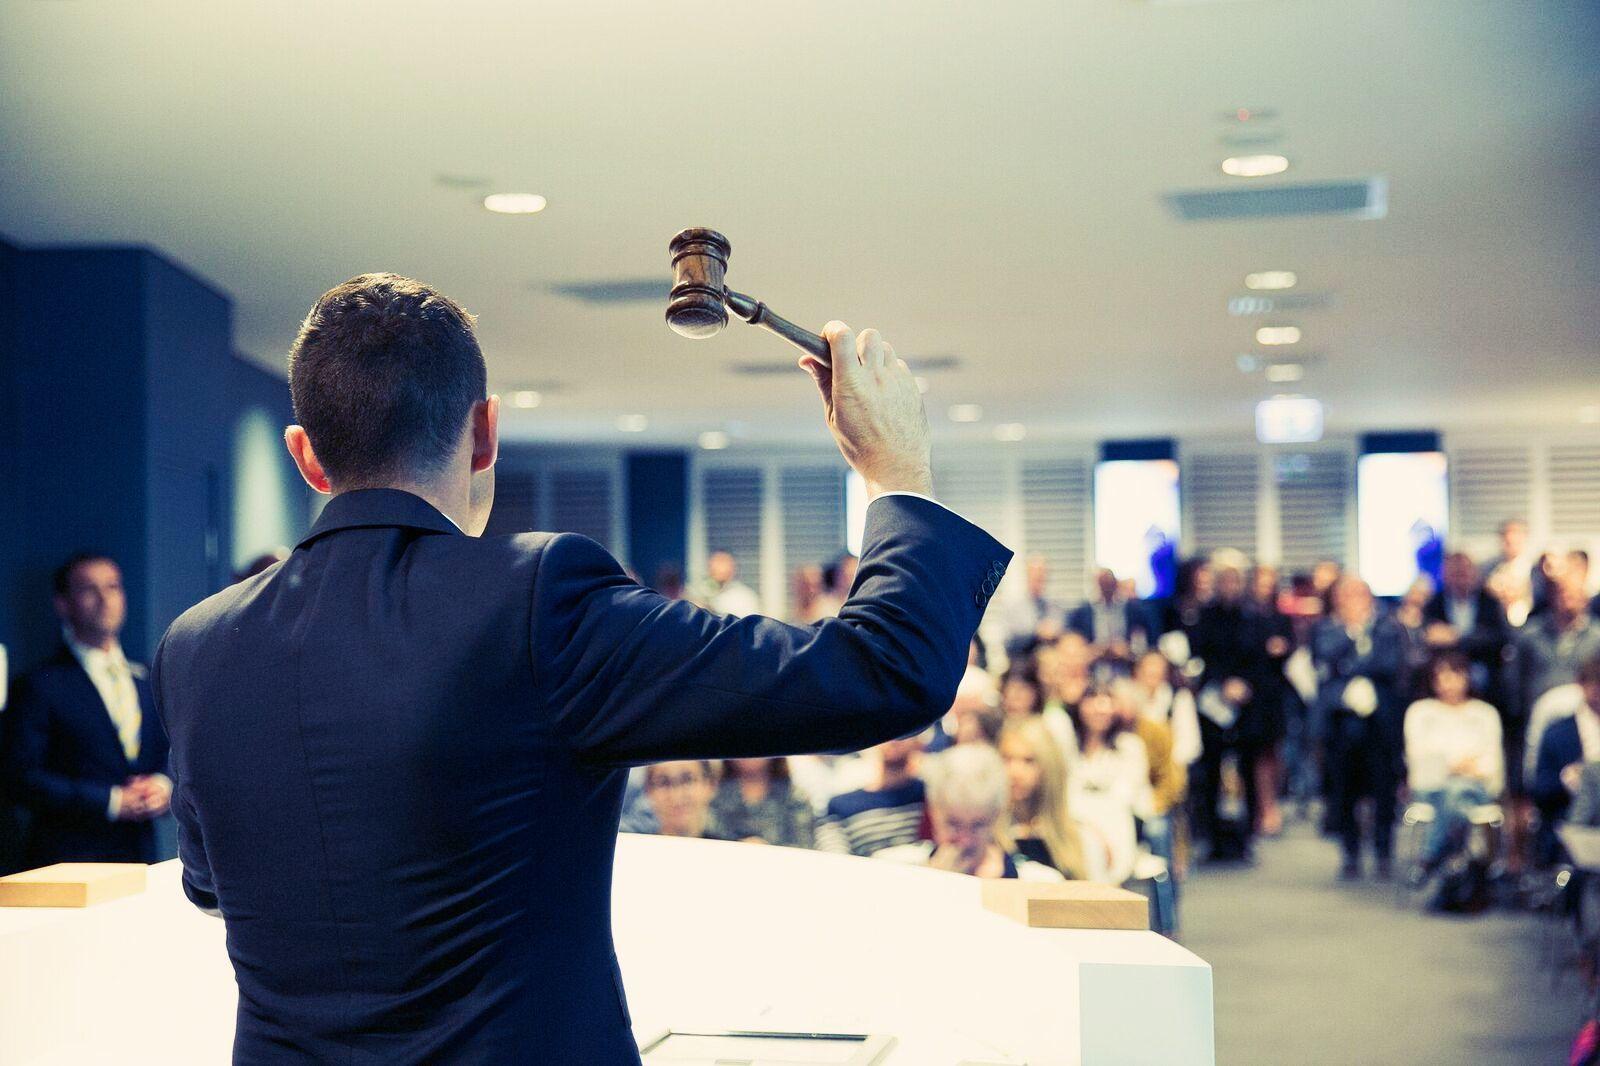 Damien auction room